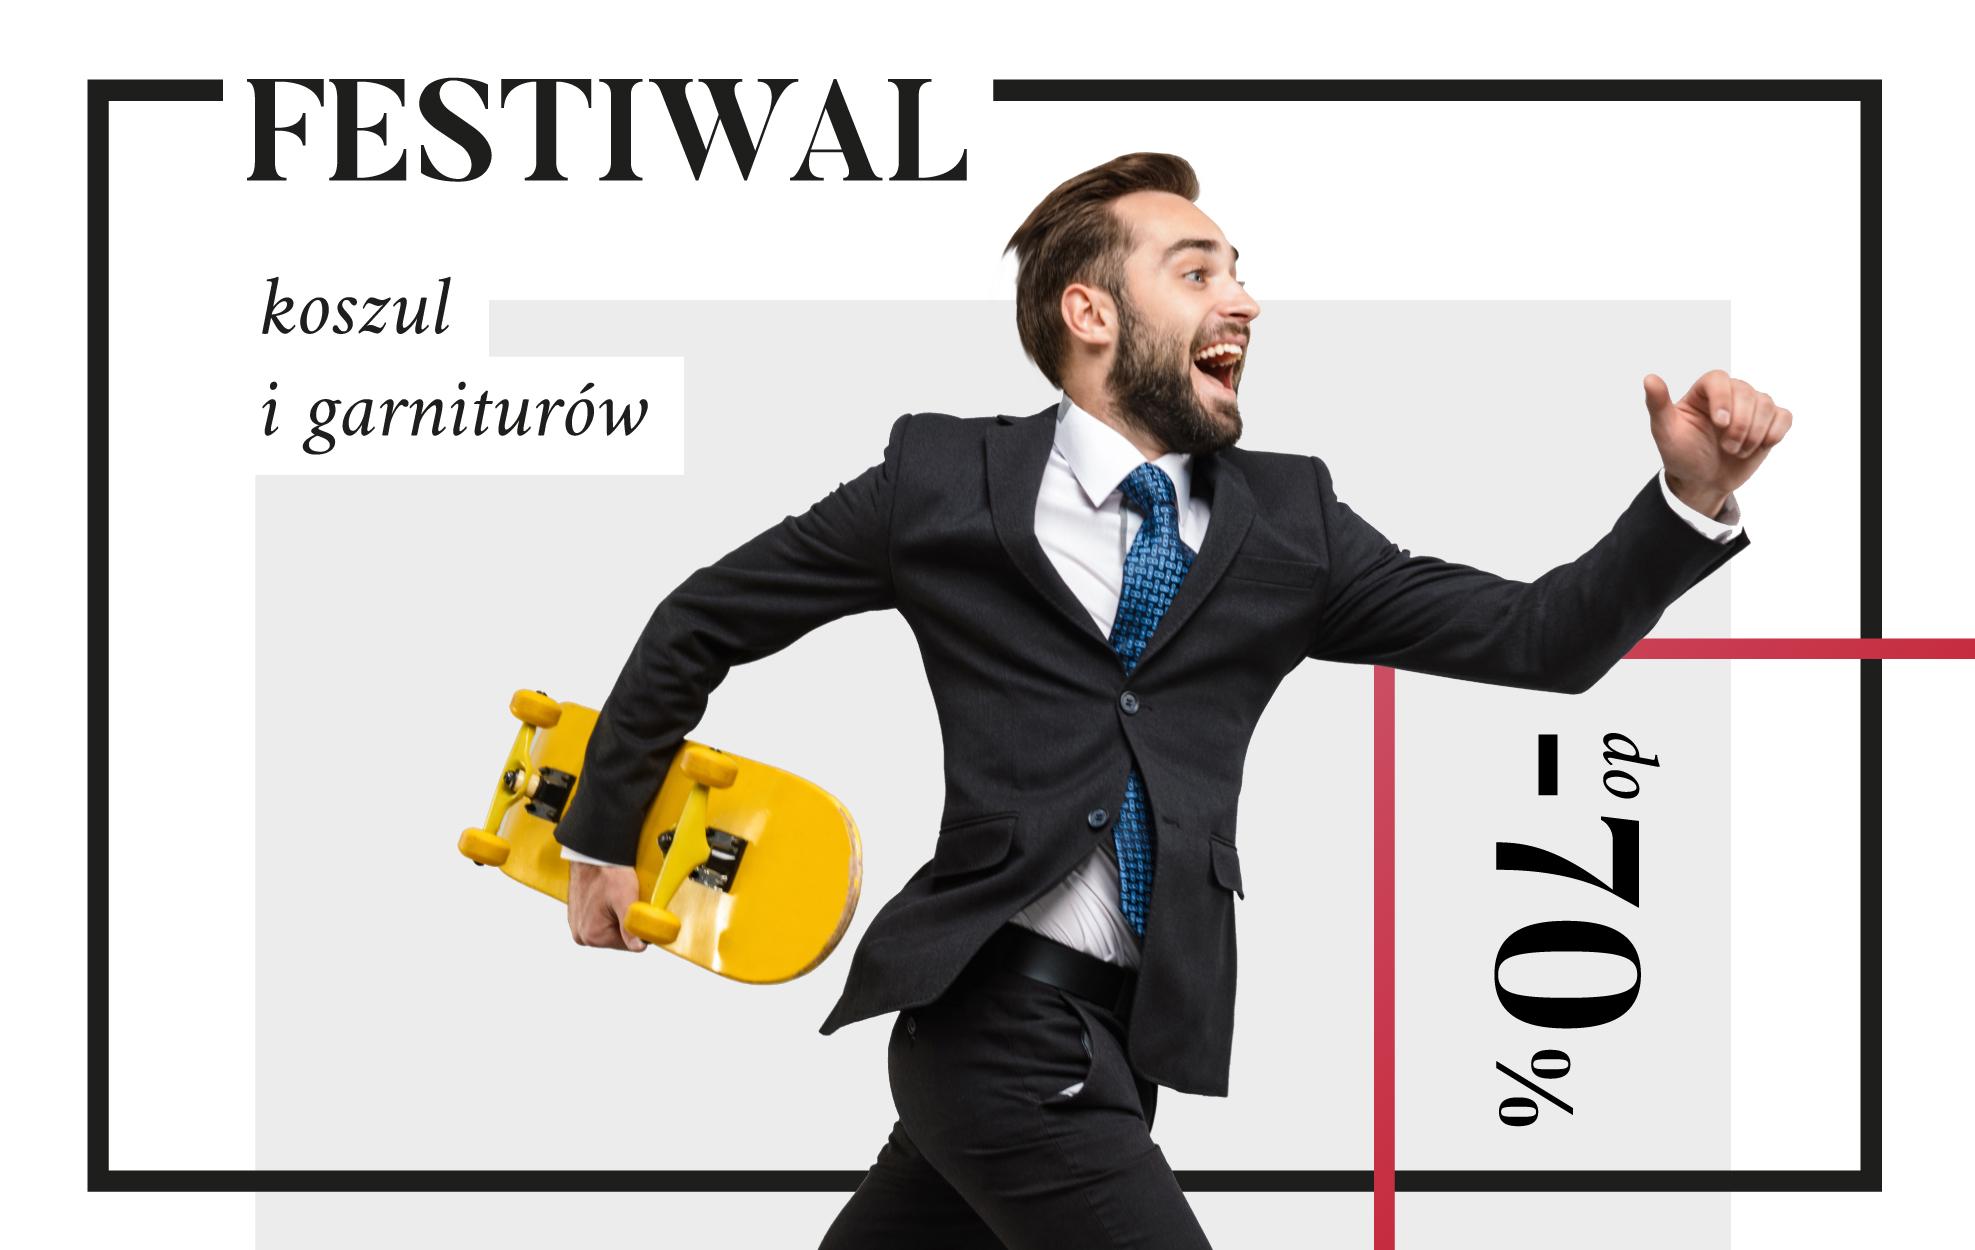 Festiwal koszul i garniturów